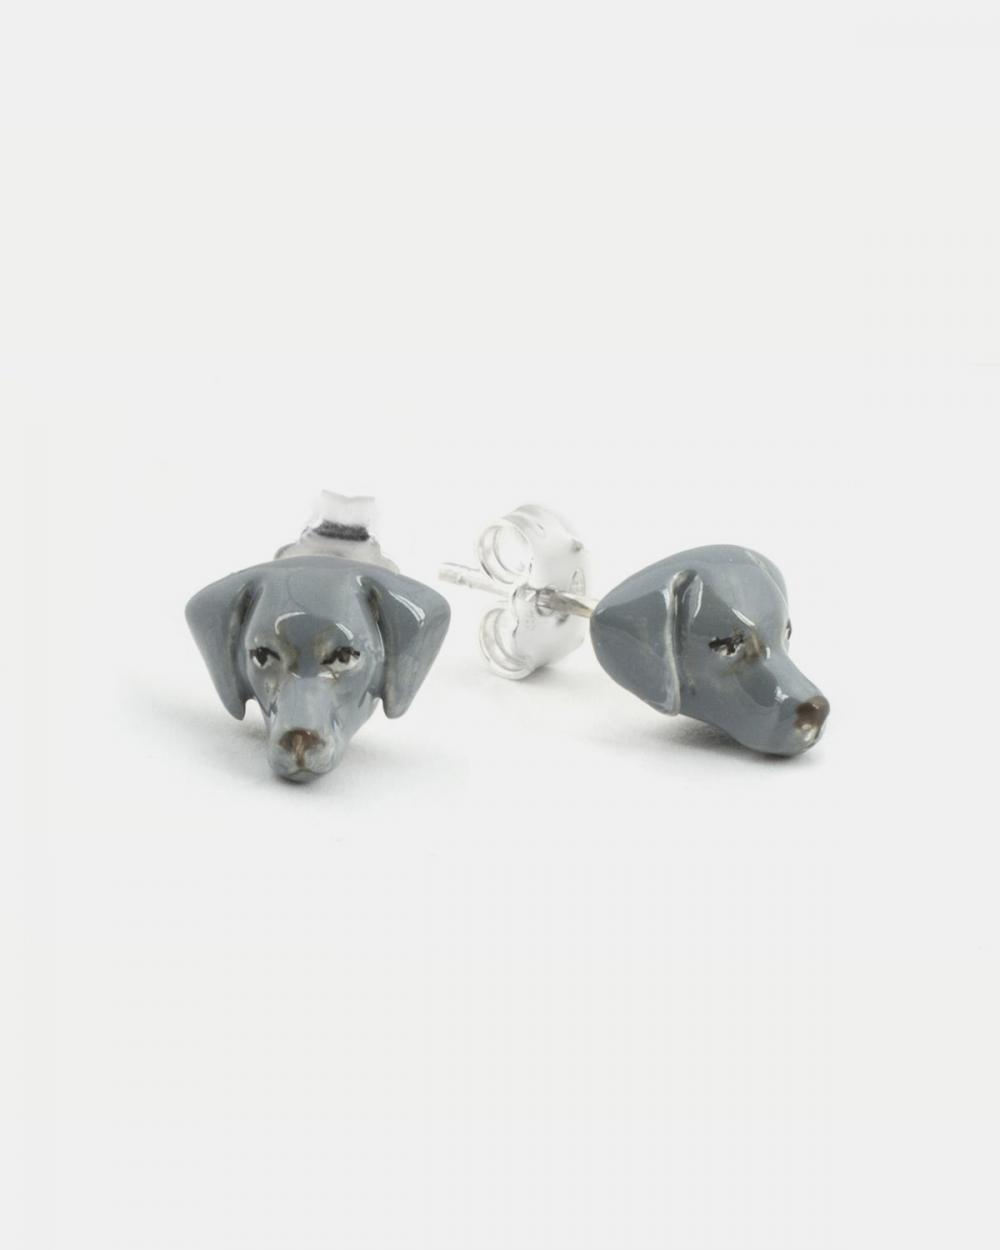 Earrings WEIMARANER COUPLE EARRINGS / ENAMELLED NOVE25